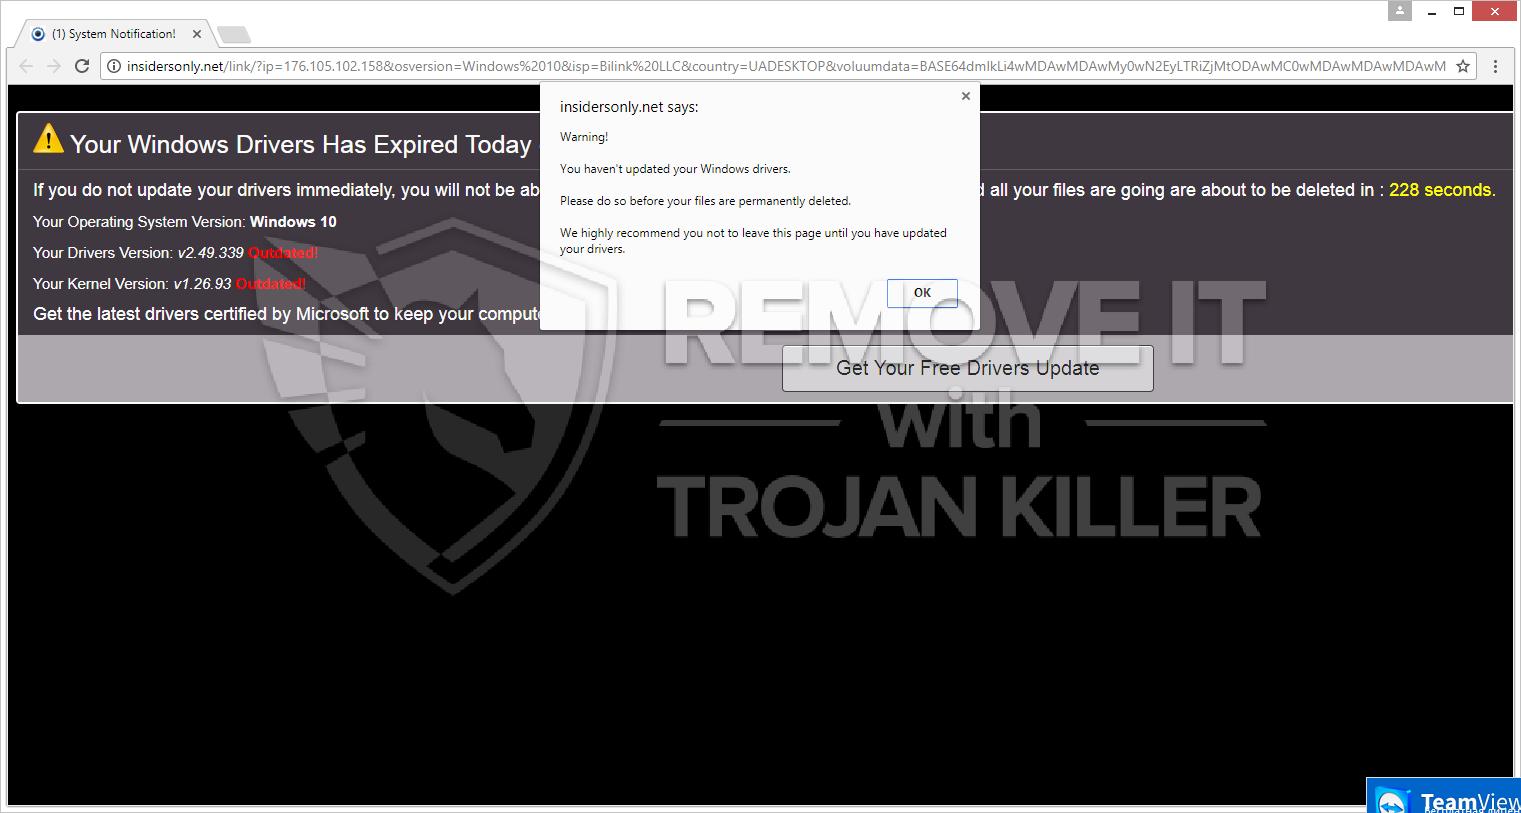 SOLVED] Please Help! CloudNet redirections! - Trojan Killer